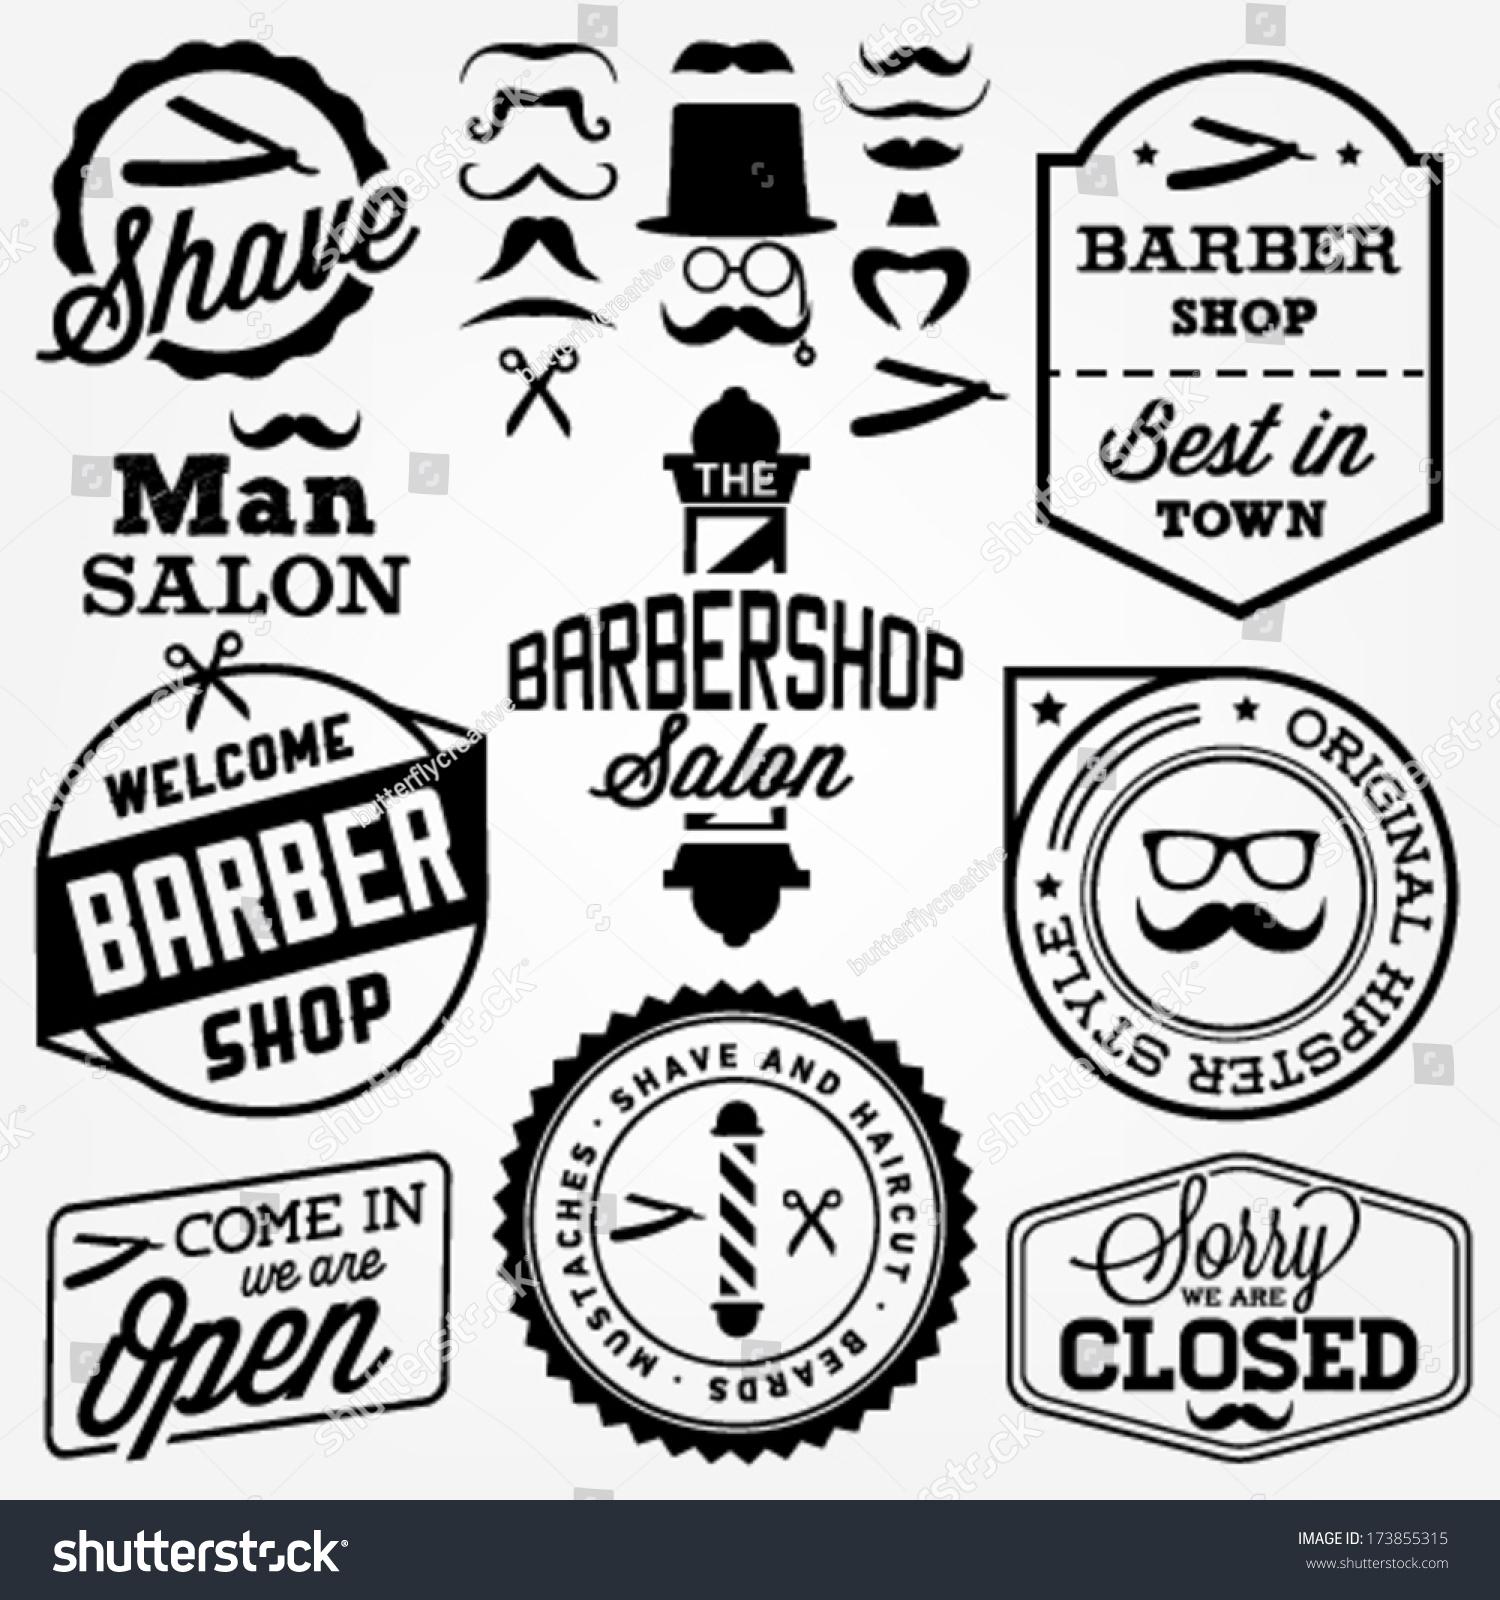 Collection Of Vintage Barber Shop Design Elements Stock Vector ...